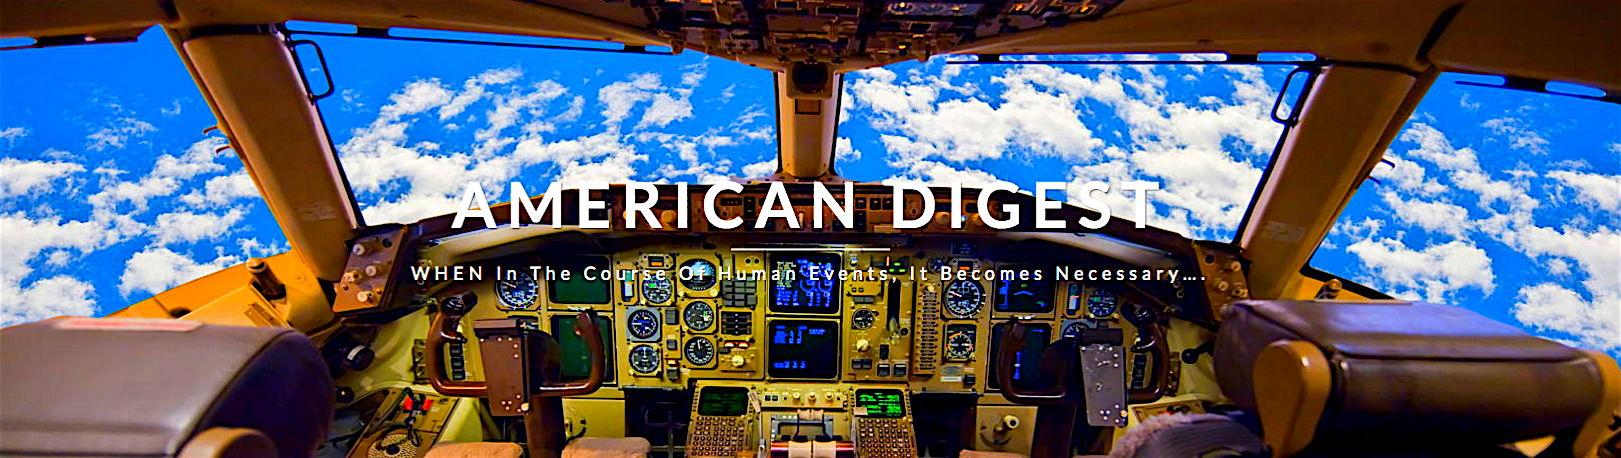 American Digest header image